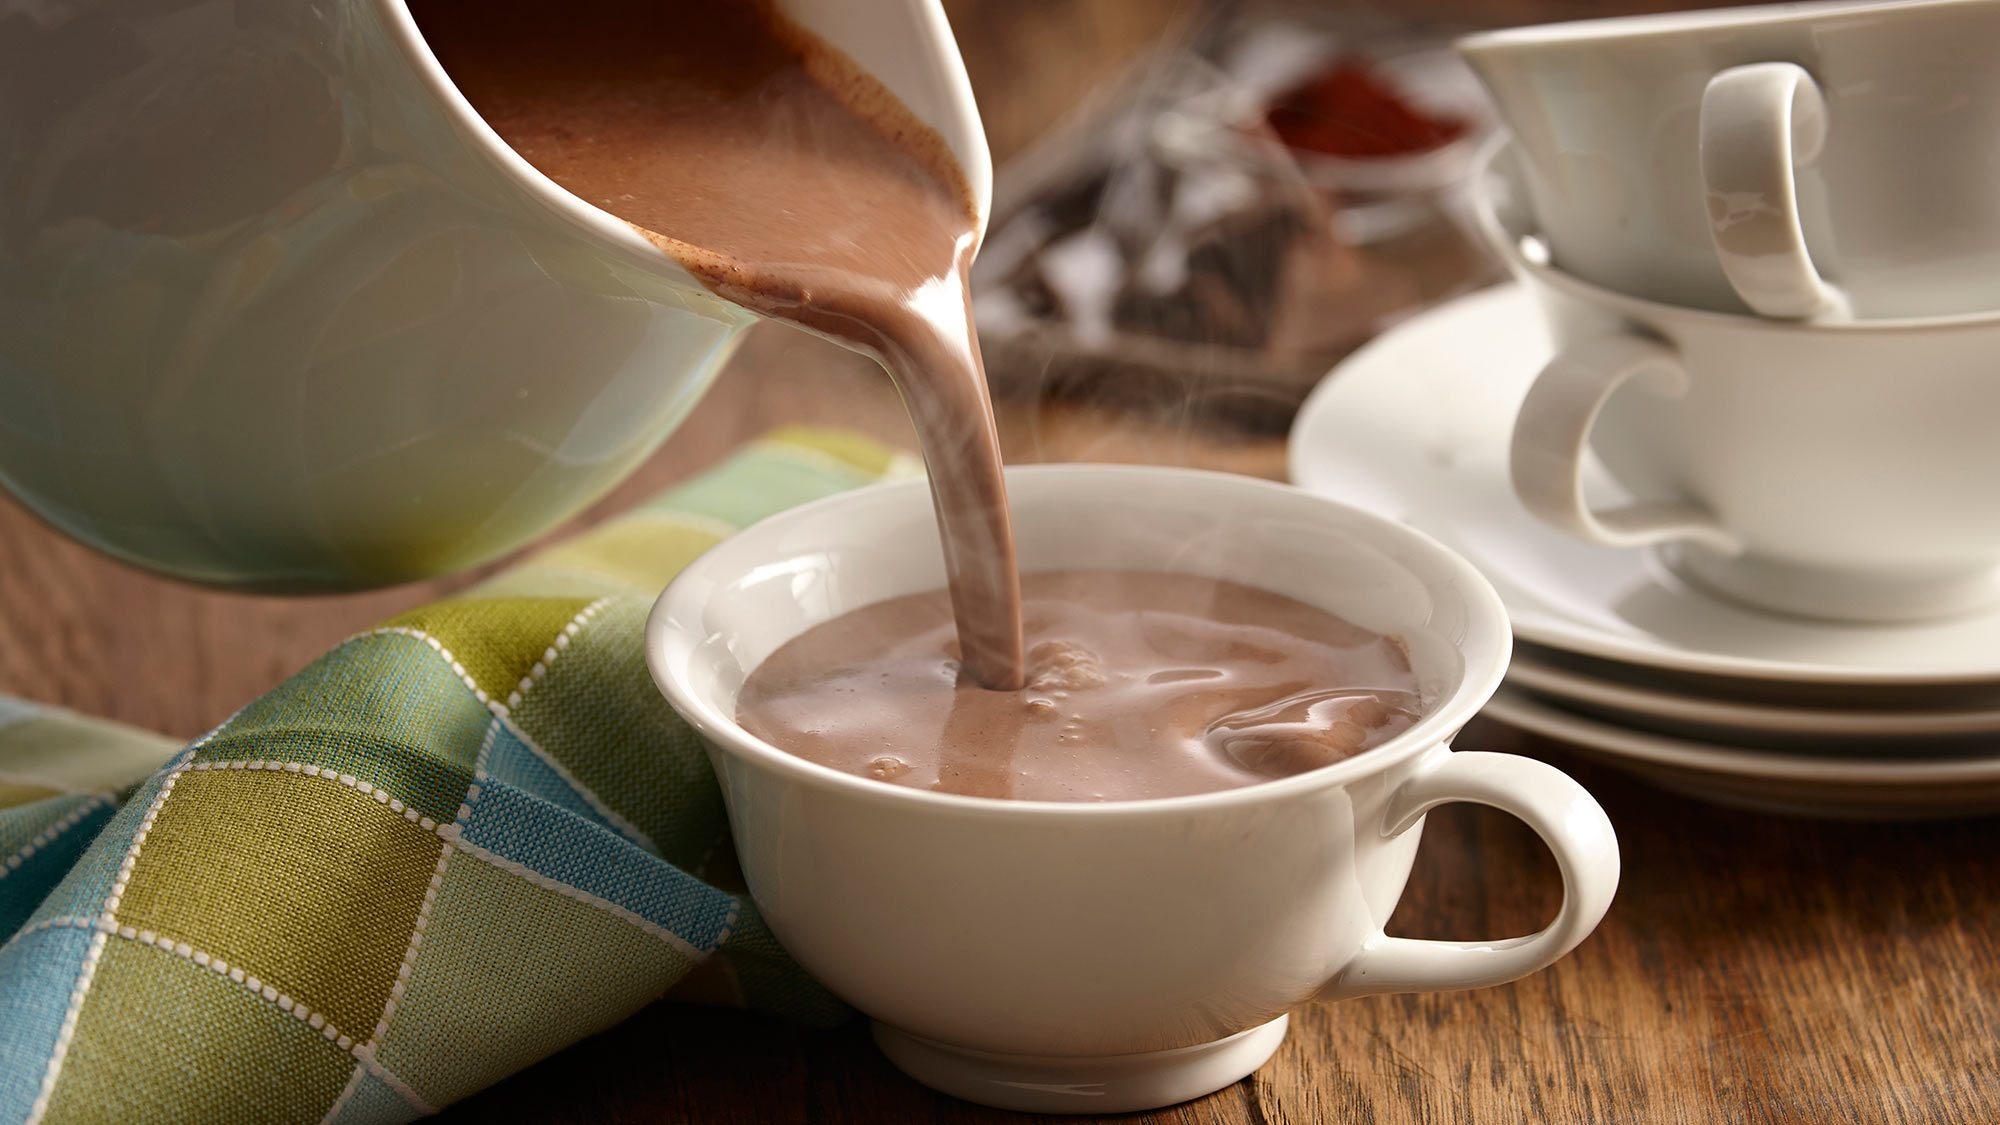 Tout Chocolat chocolate caliente restaurante